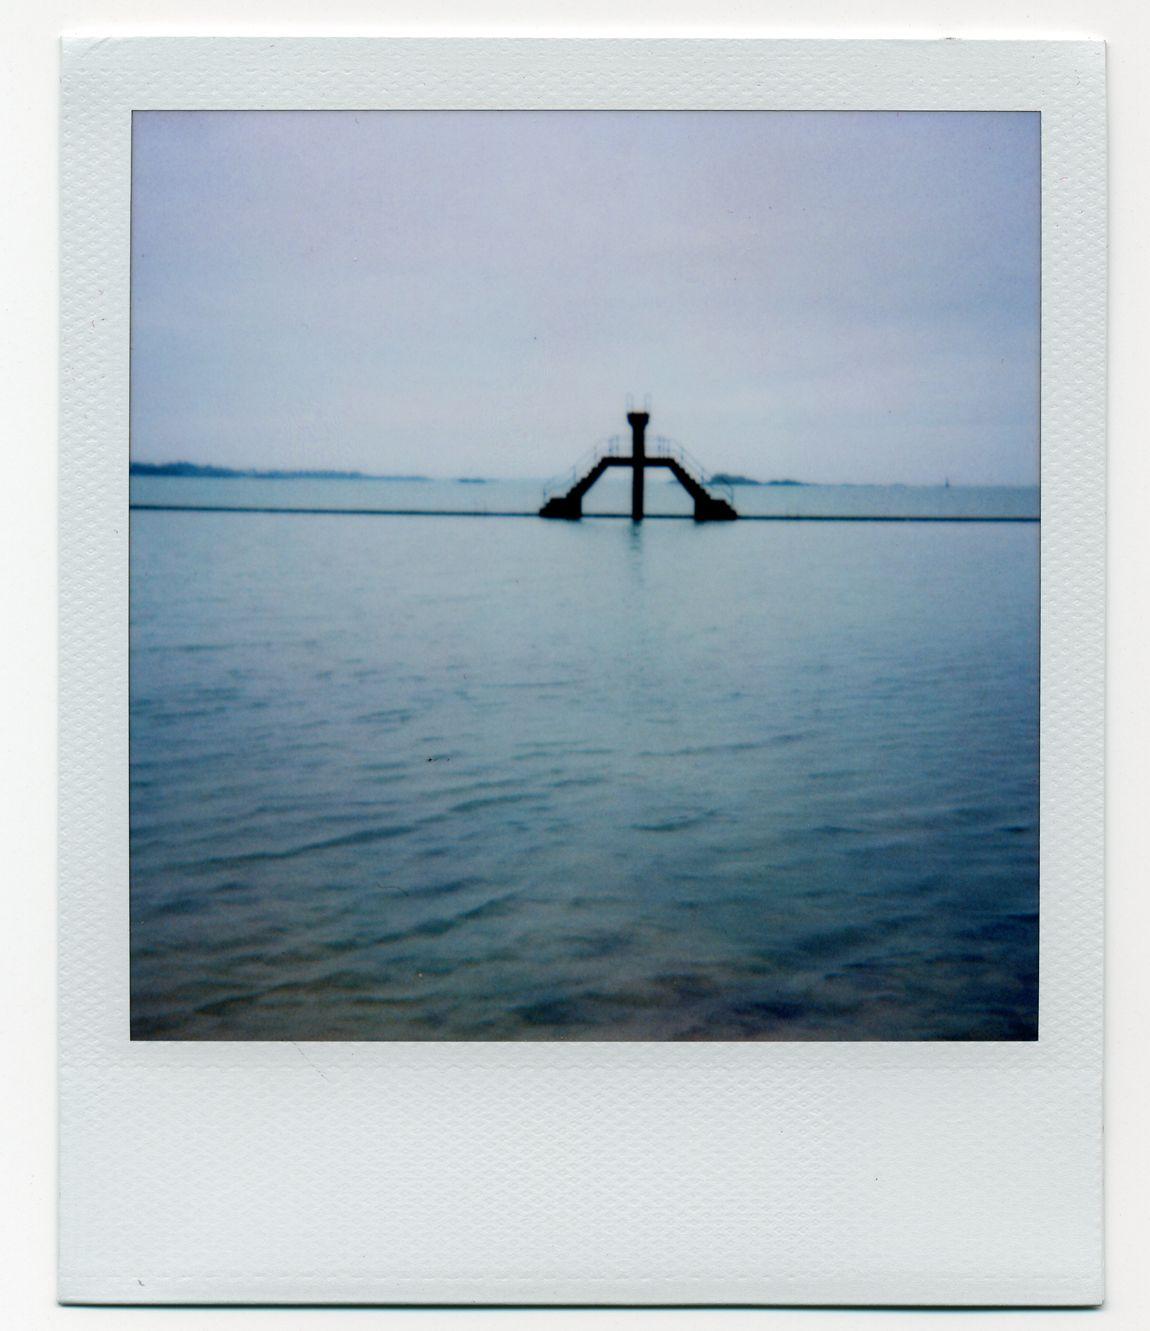 St-Mallo - Camera : SX-70 - Film : Polaroid Time Zero